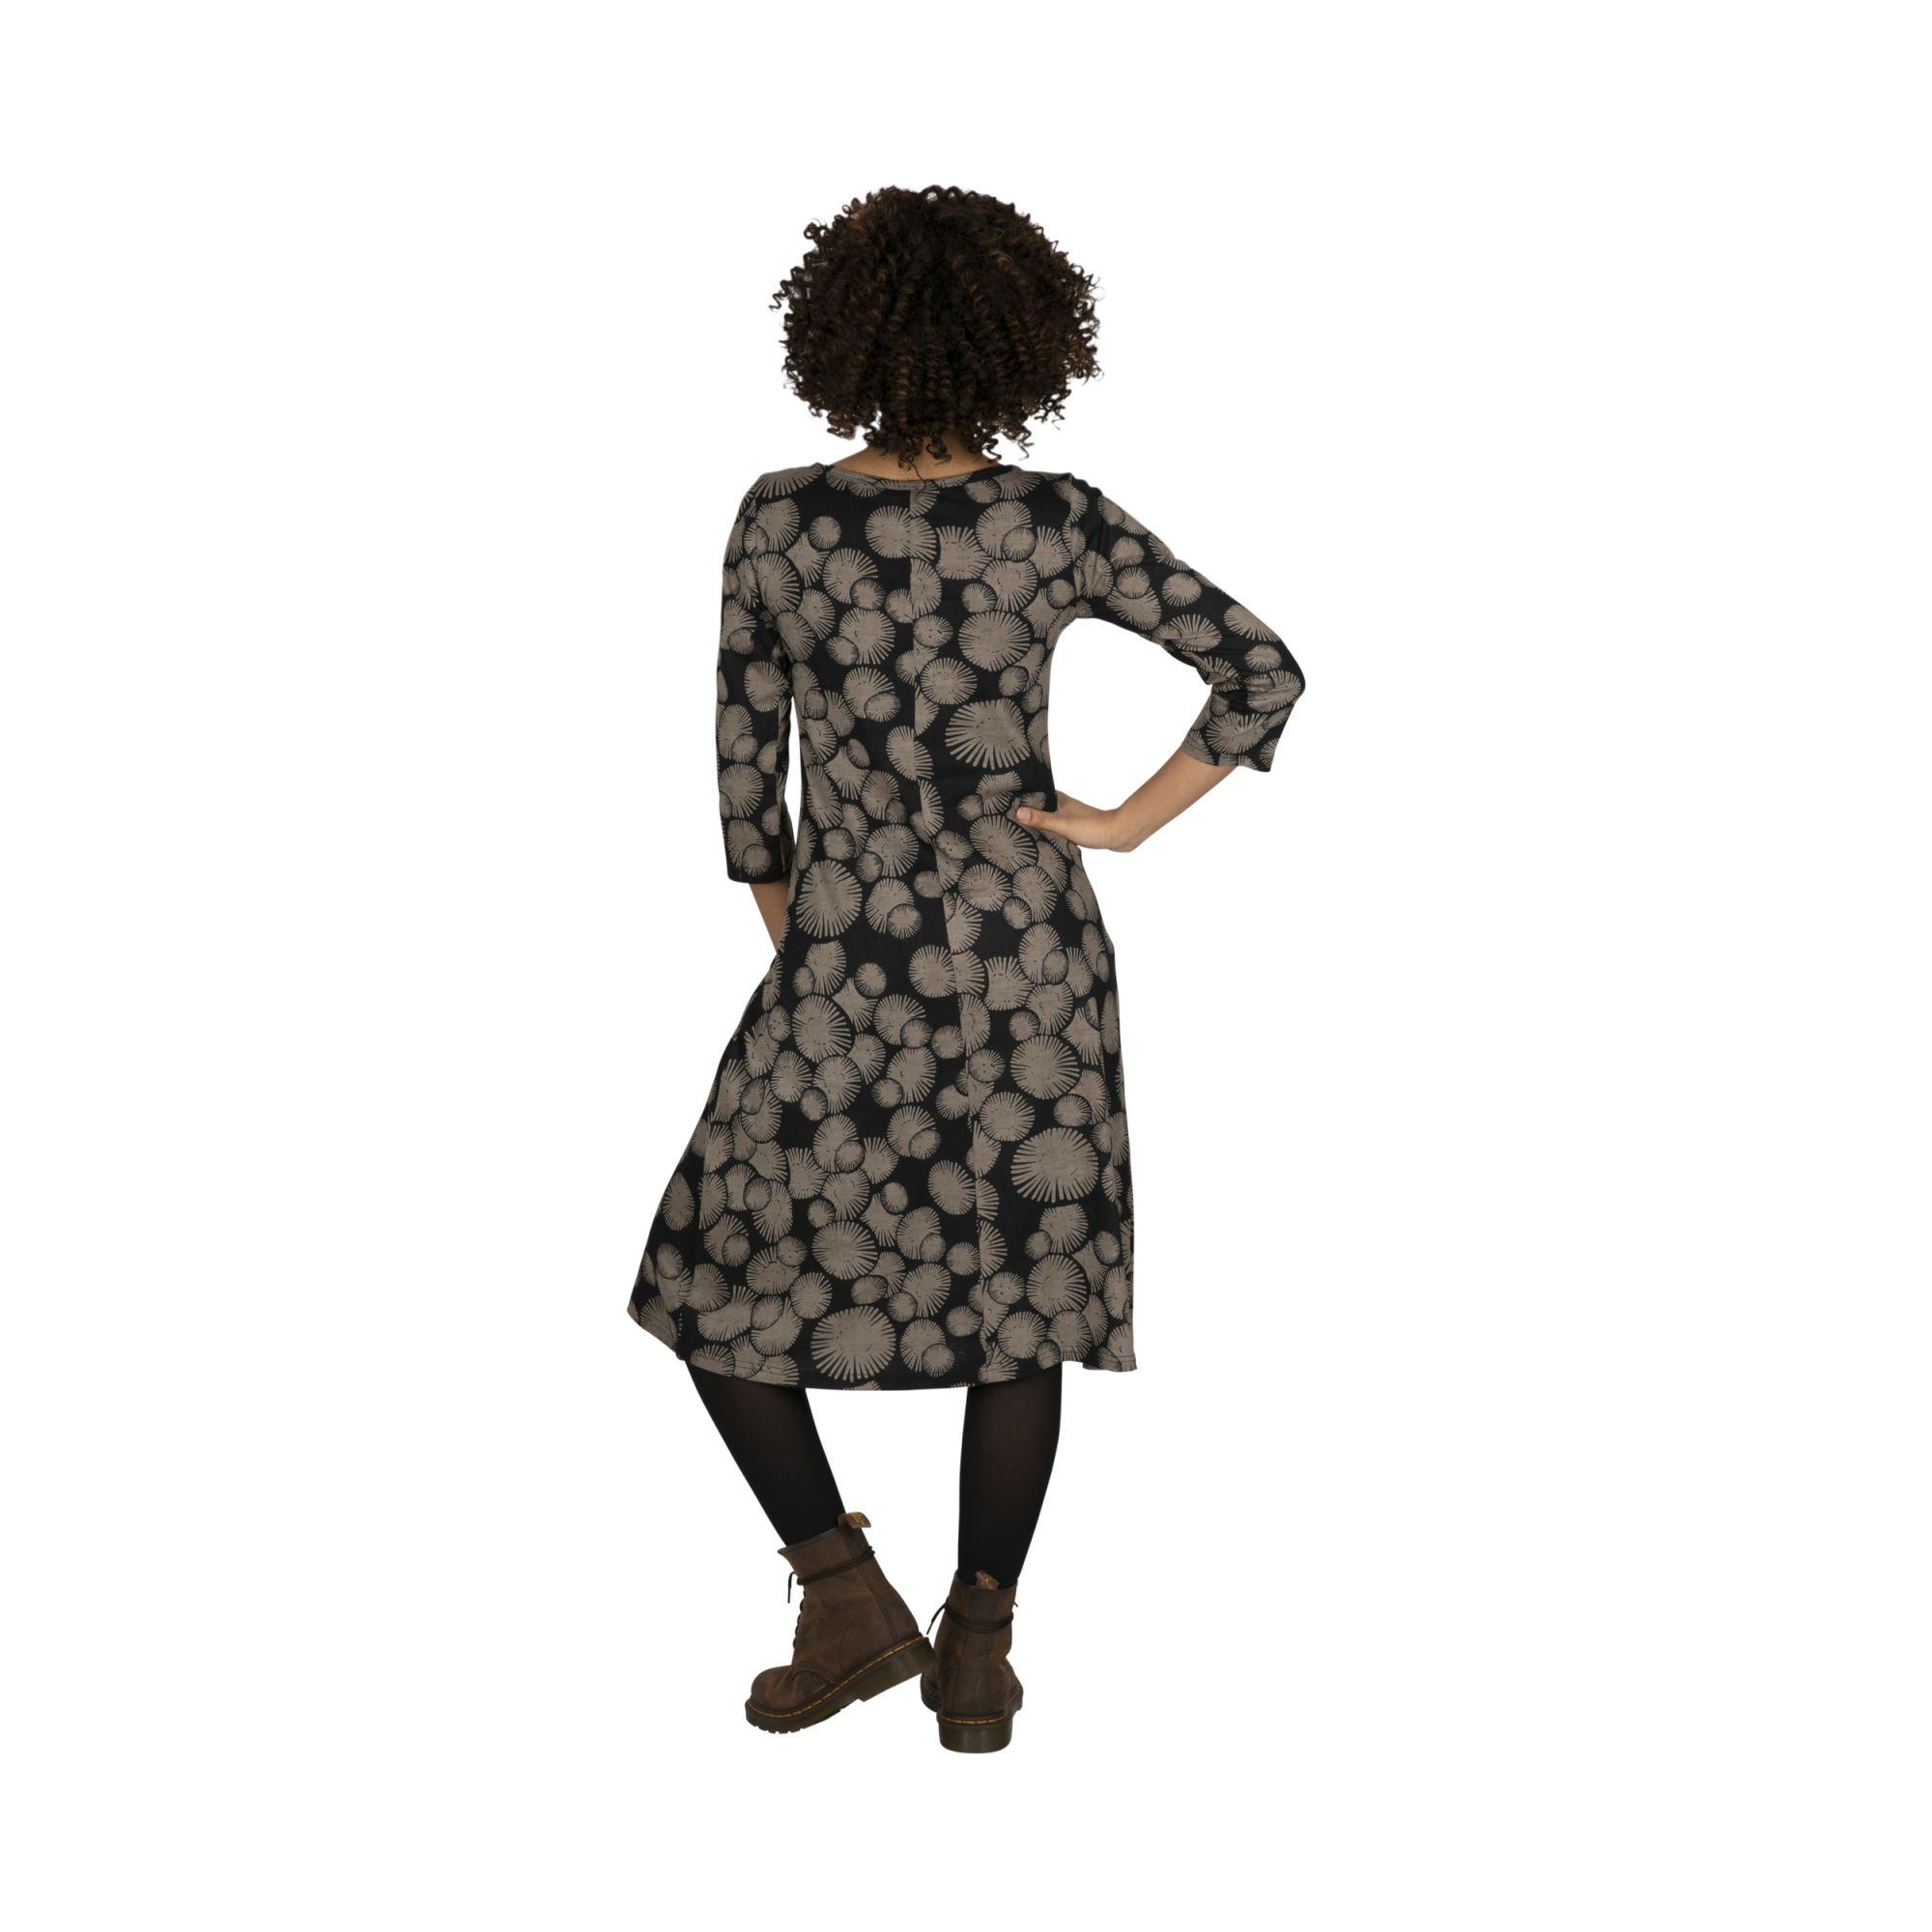 Robe femme originale aux manches 3/4 Catarina